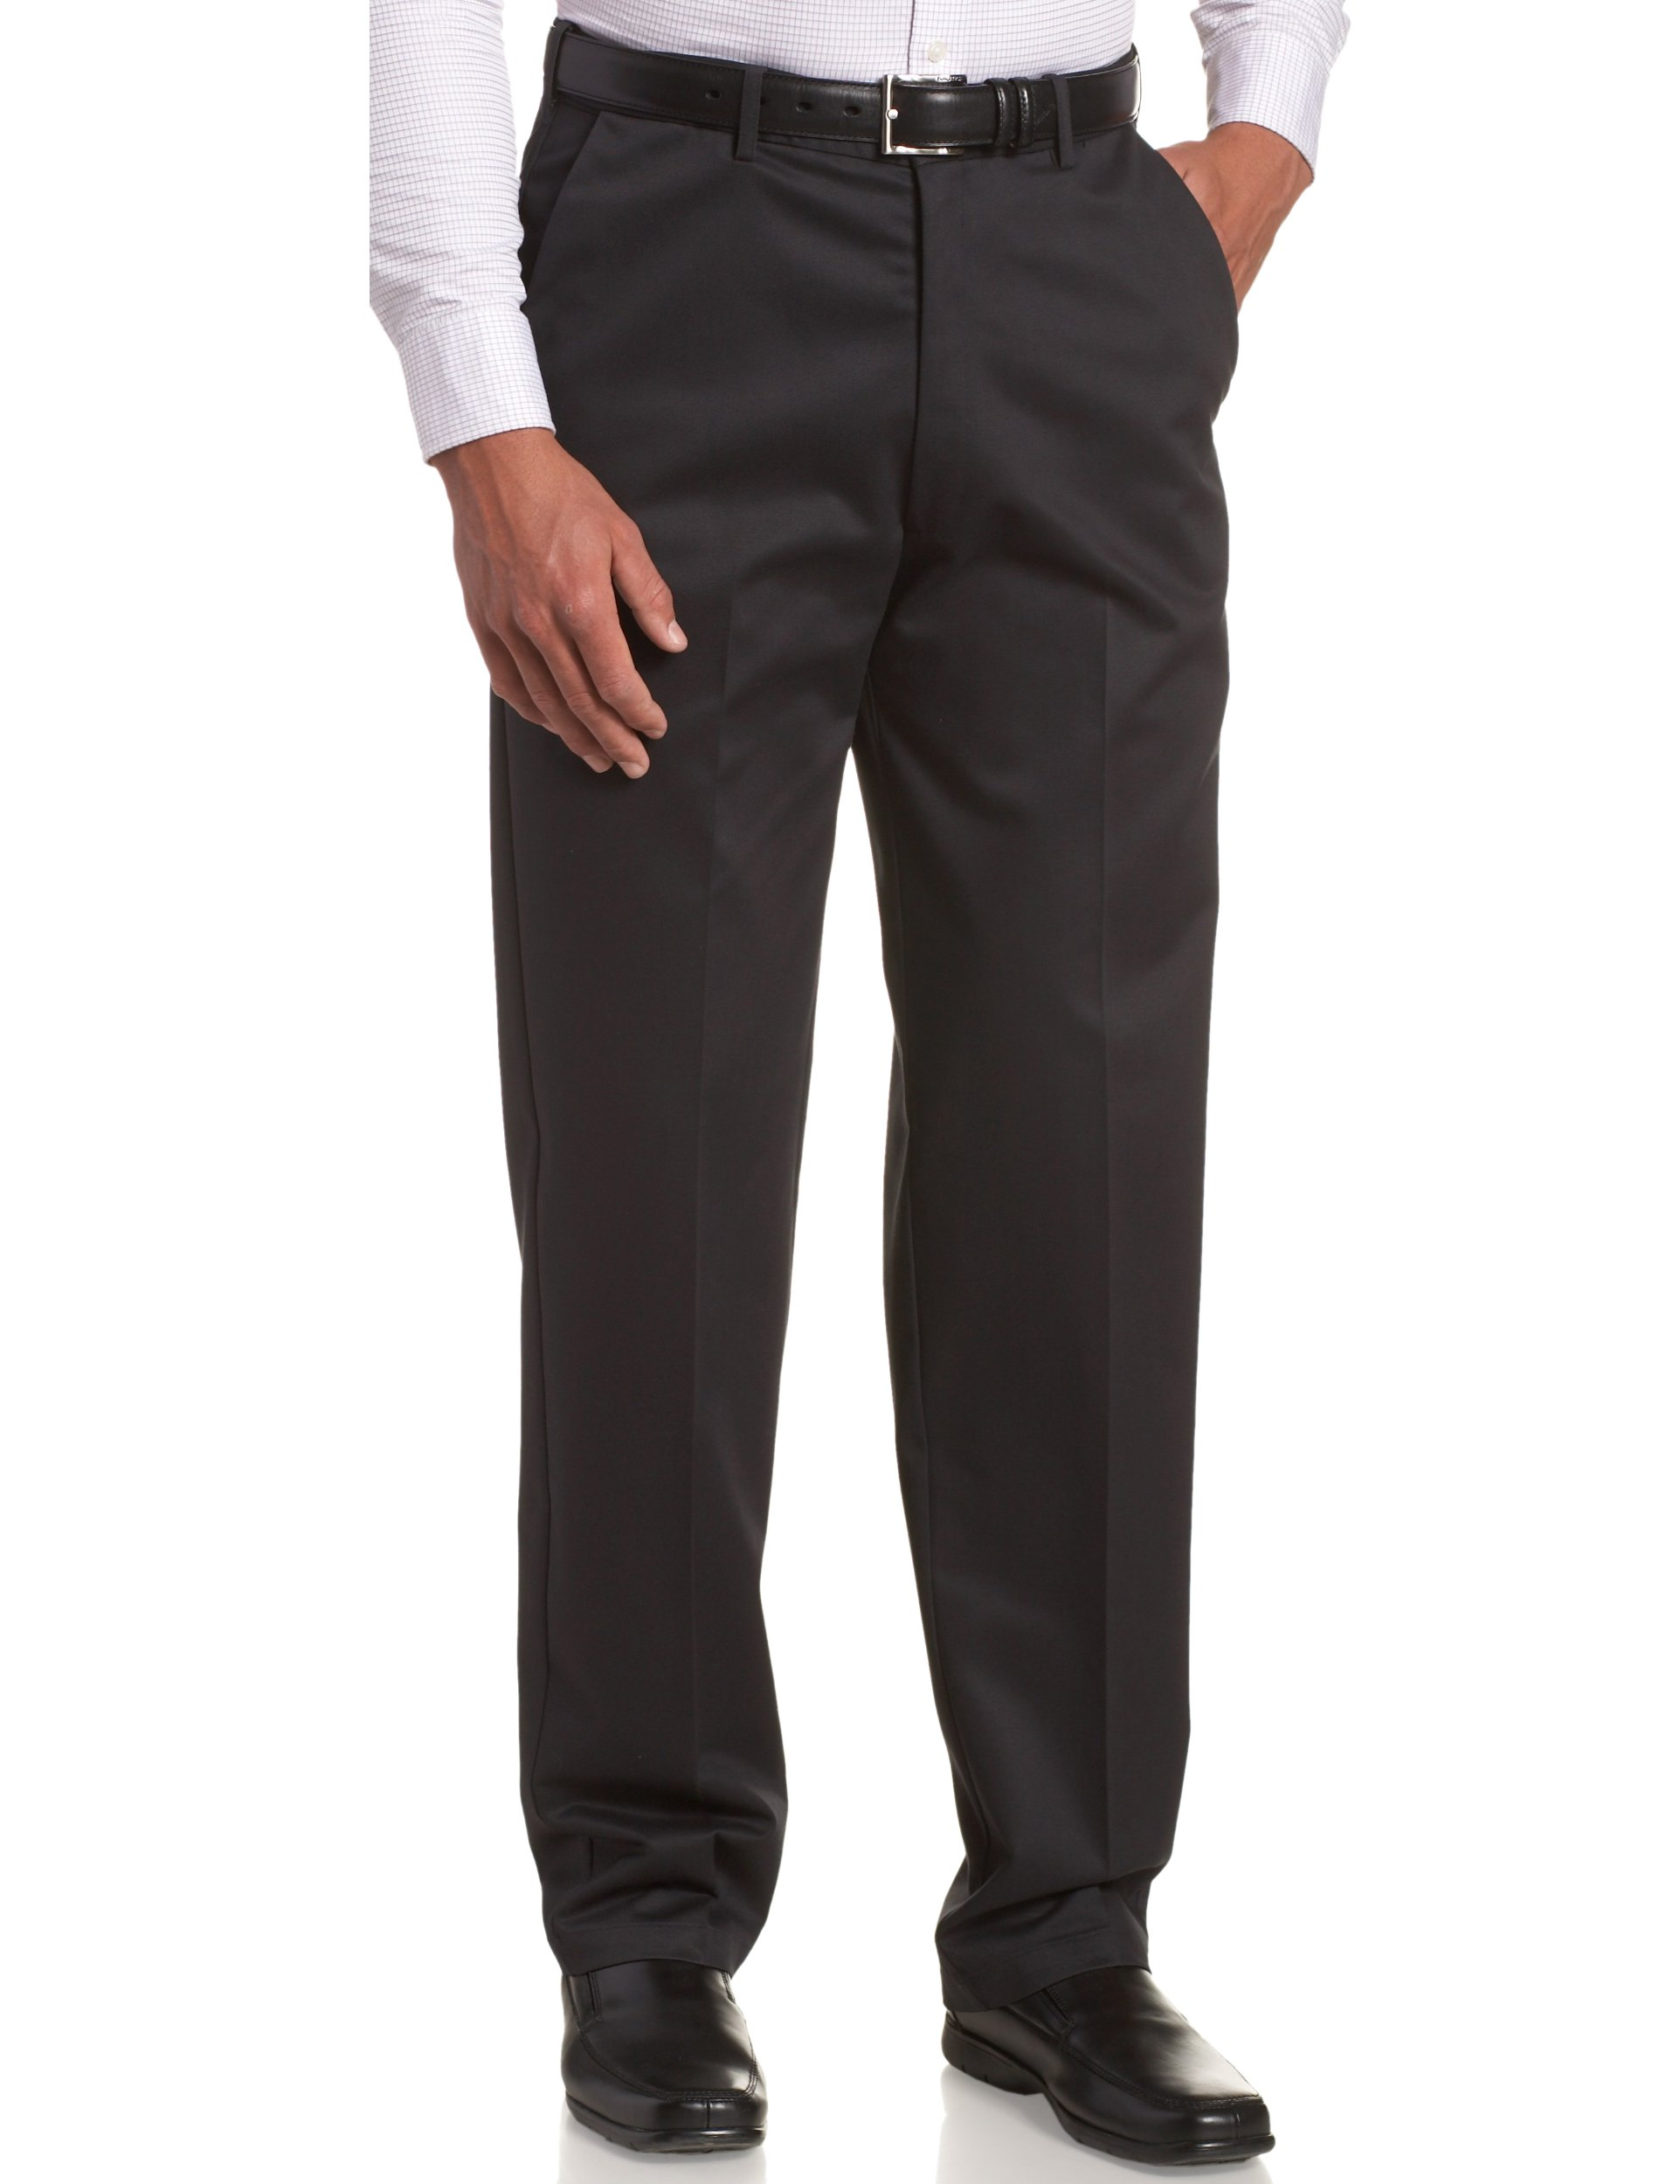 Haggar Men's Big-Tall Work to Weekend Hidden Expandable Waist Plain Front Pant,Dark Navy,48x32